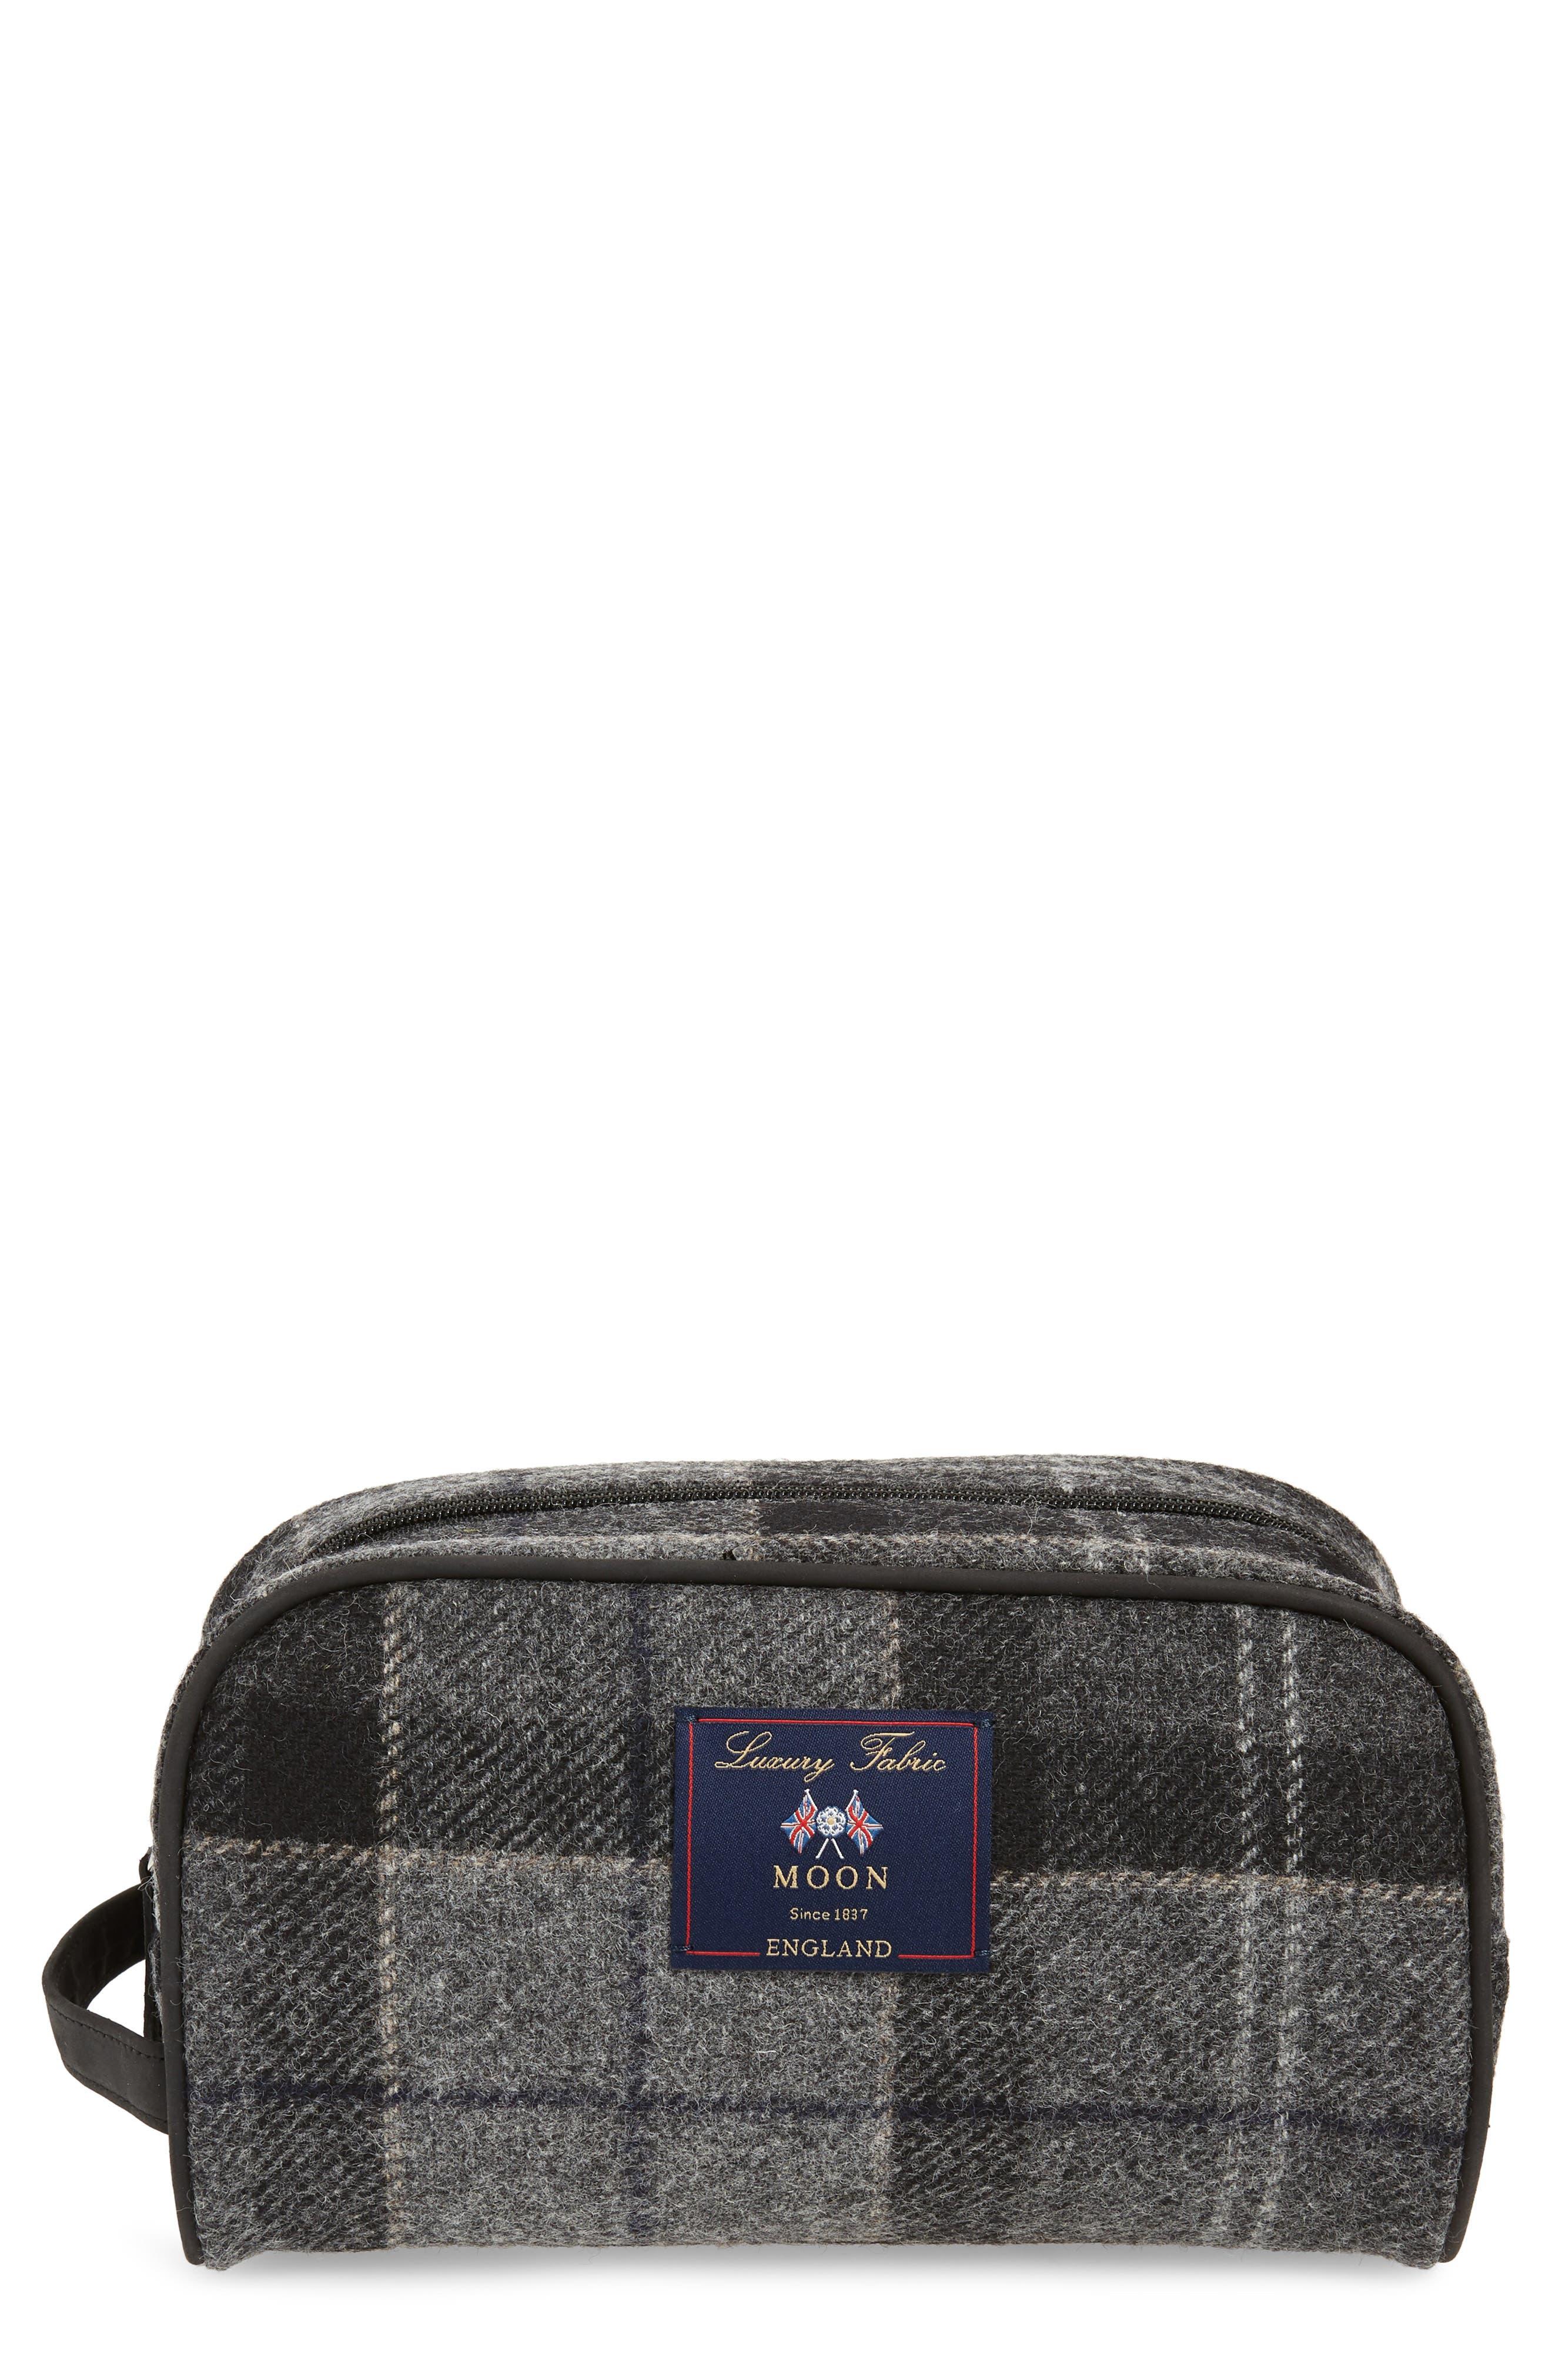 Shadow Tartan Wool Travel Kit,                             Main thumbnail 1, color,                             BLACK/ GREY TARTAN